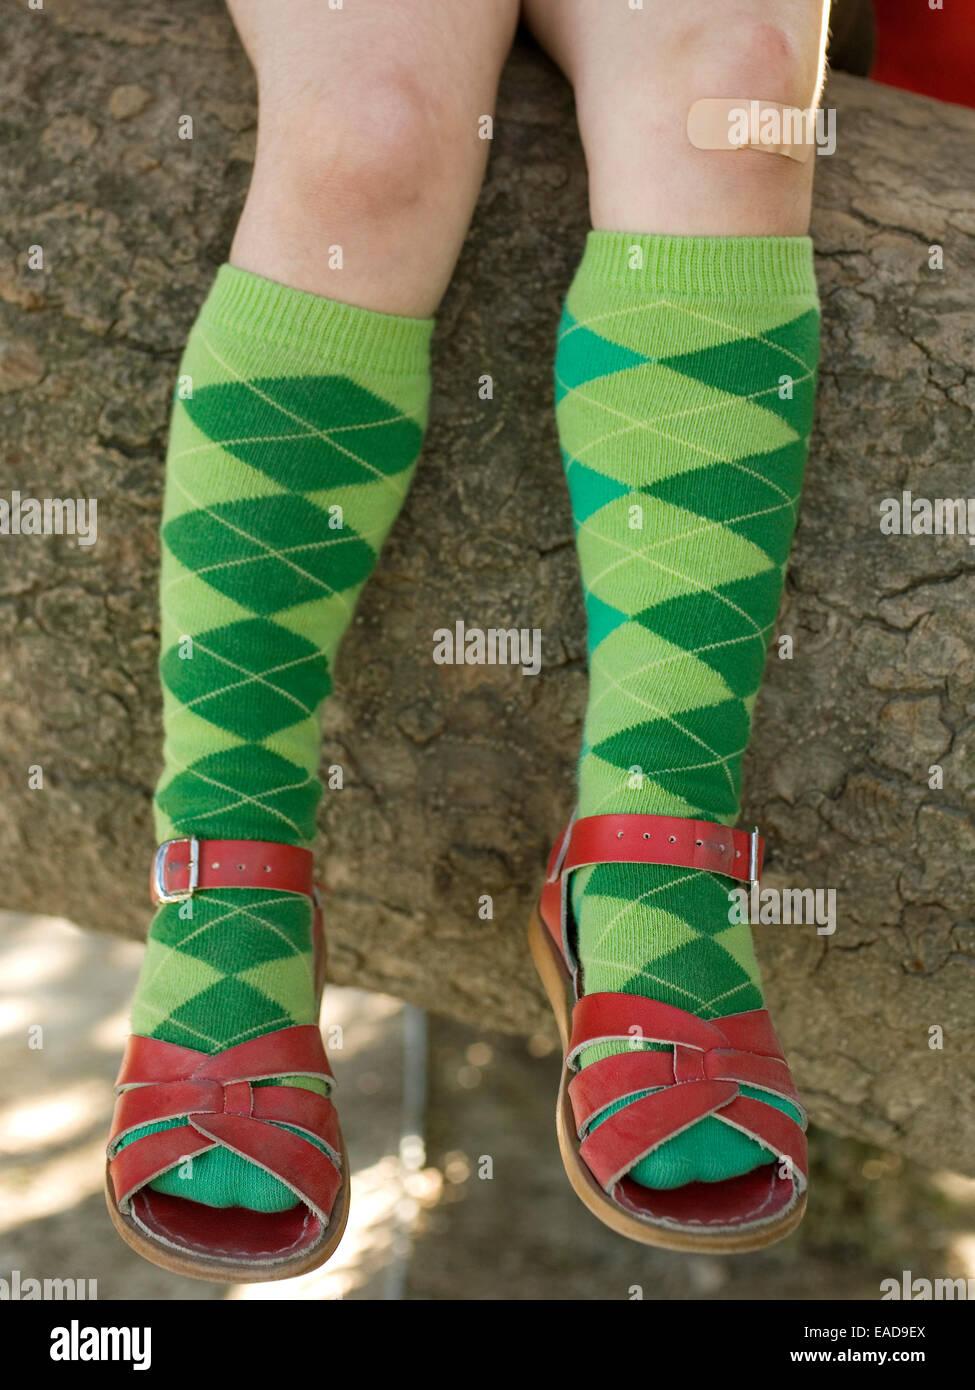 e0d1f177d44 Knee Socks Stock Photos   Knee Socks Stock Images - Alamy